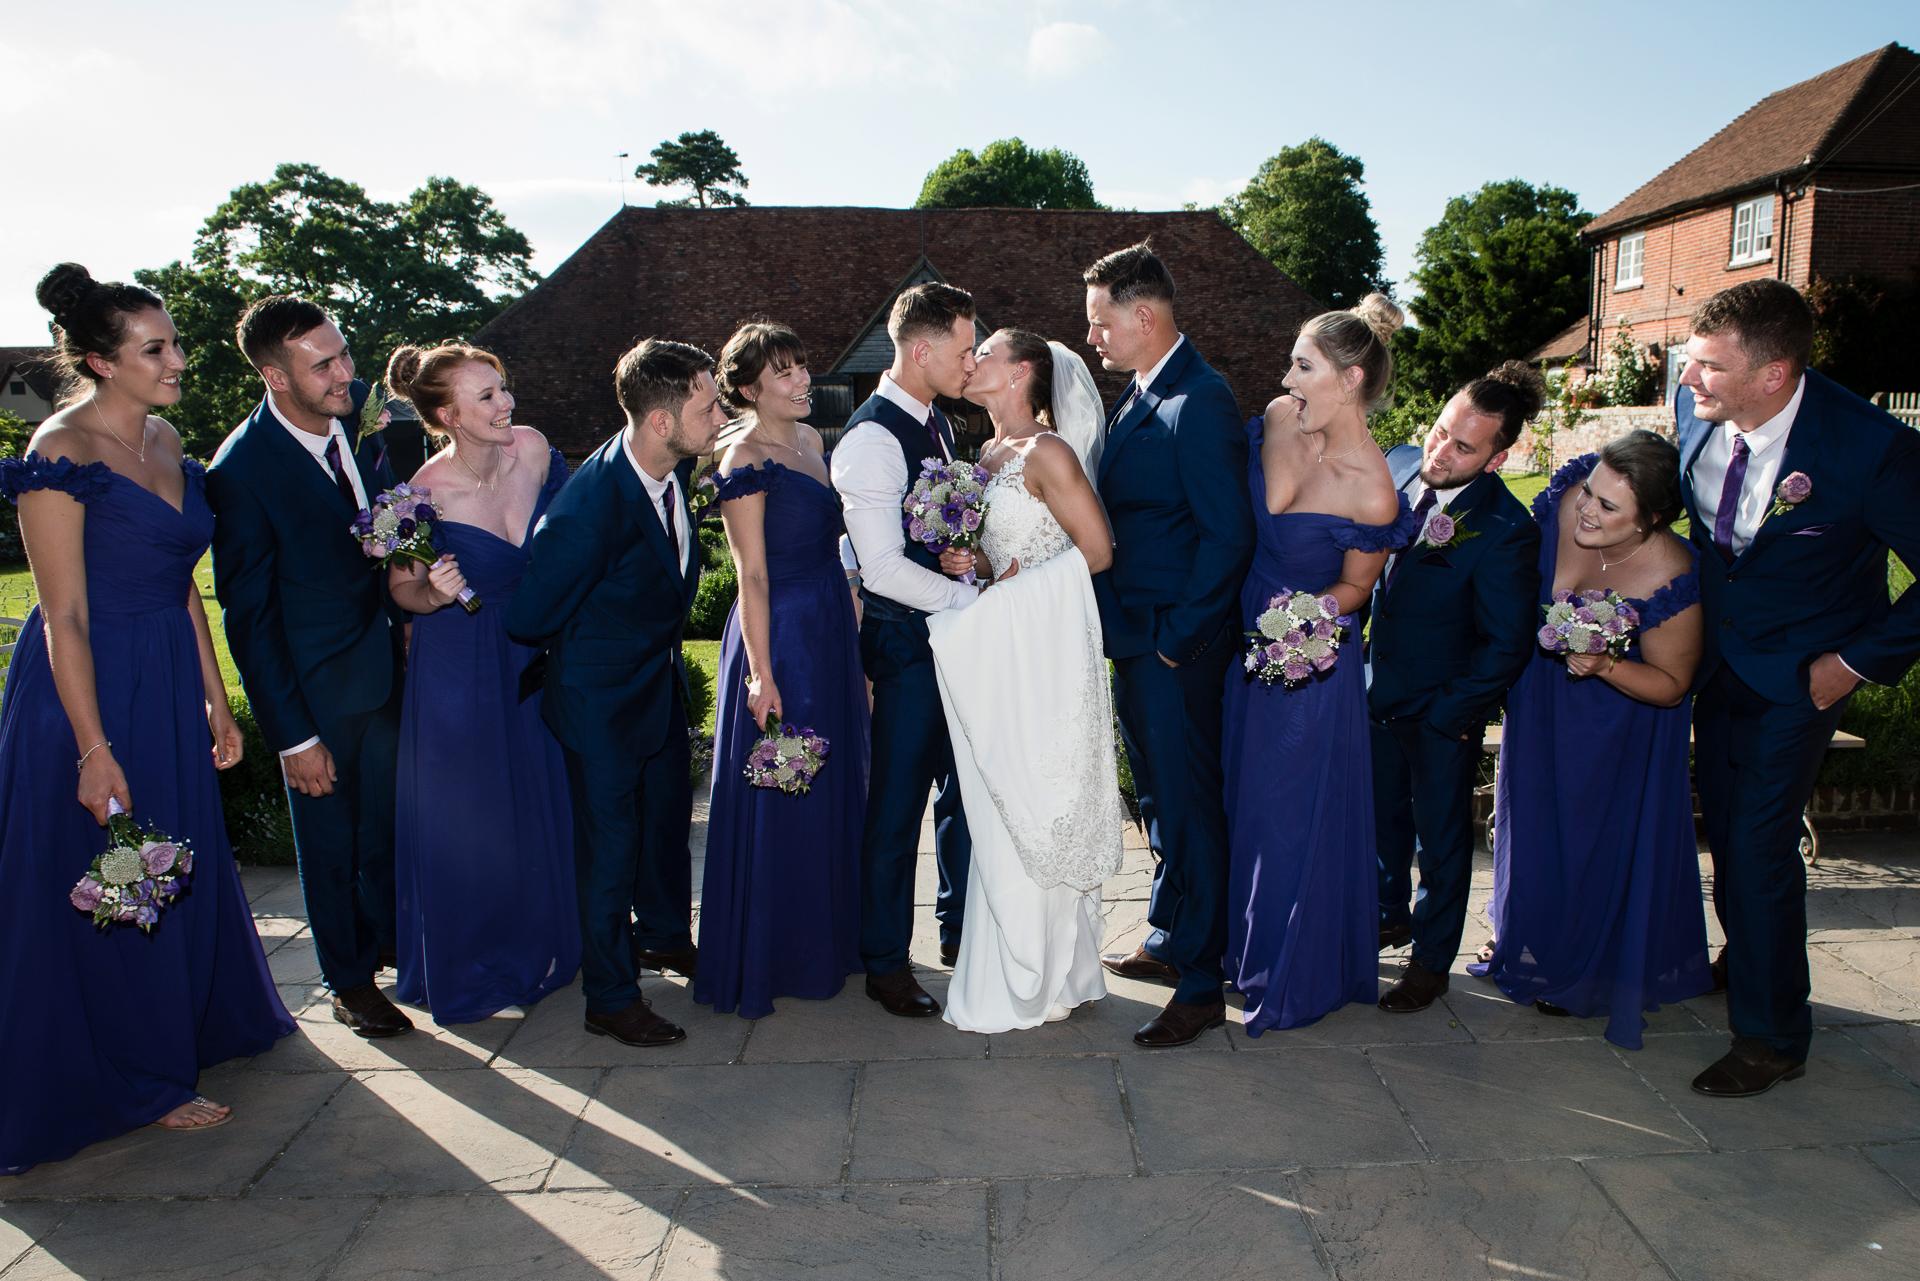 Ufton Court Wedding Photography36.JPG